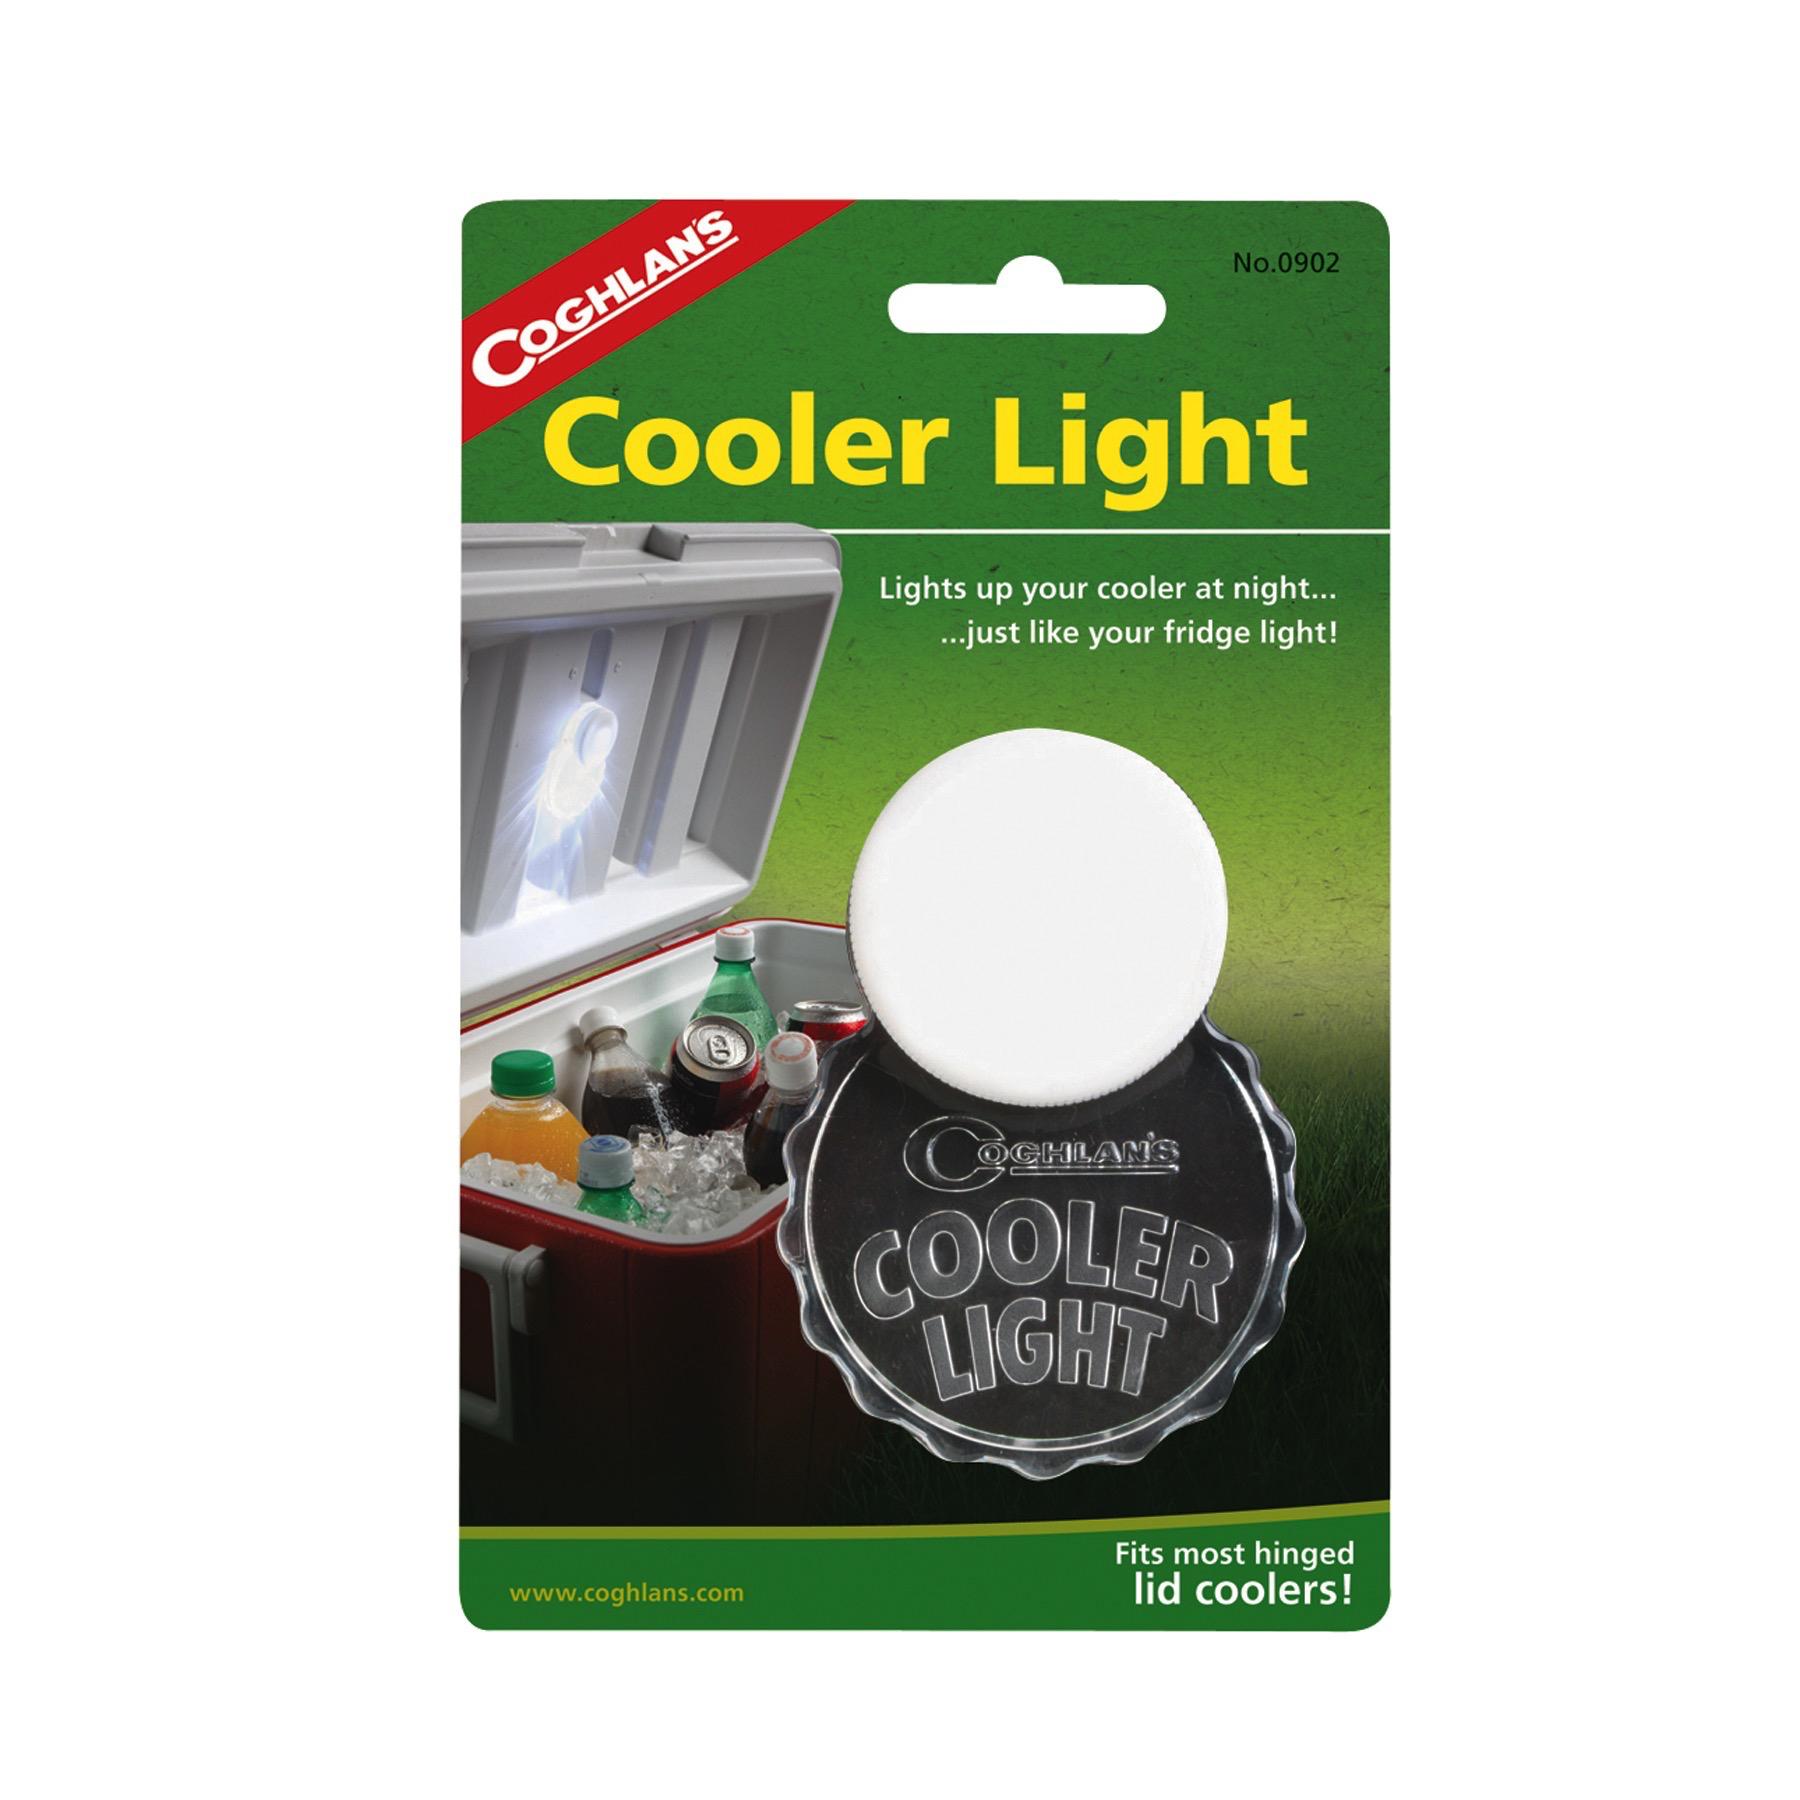 Coghlan/'s Piezoelectric Lighter Solid State for Starting Burners Pilot Lights